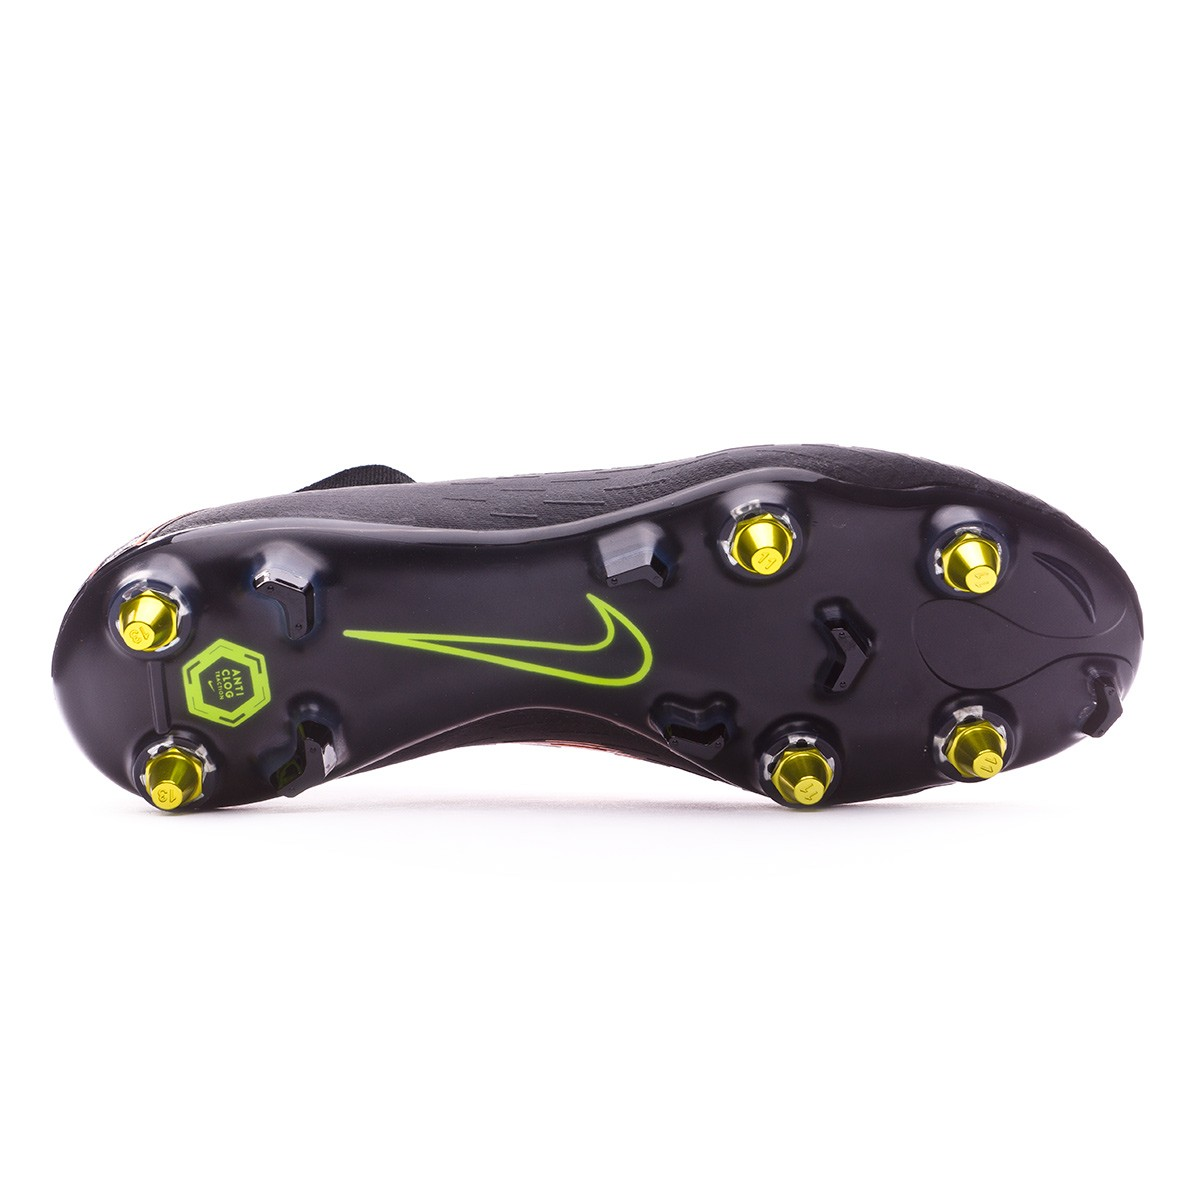 ccaaf71d47148 Chuteira Nike Mercurial Superfly VI Elite SG-Pro Anti-Clog Black-Total  orange-White - Loja de futebol Fútbol Emotion